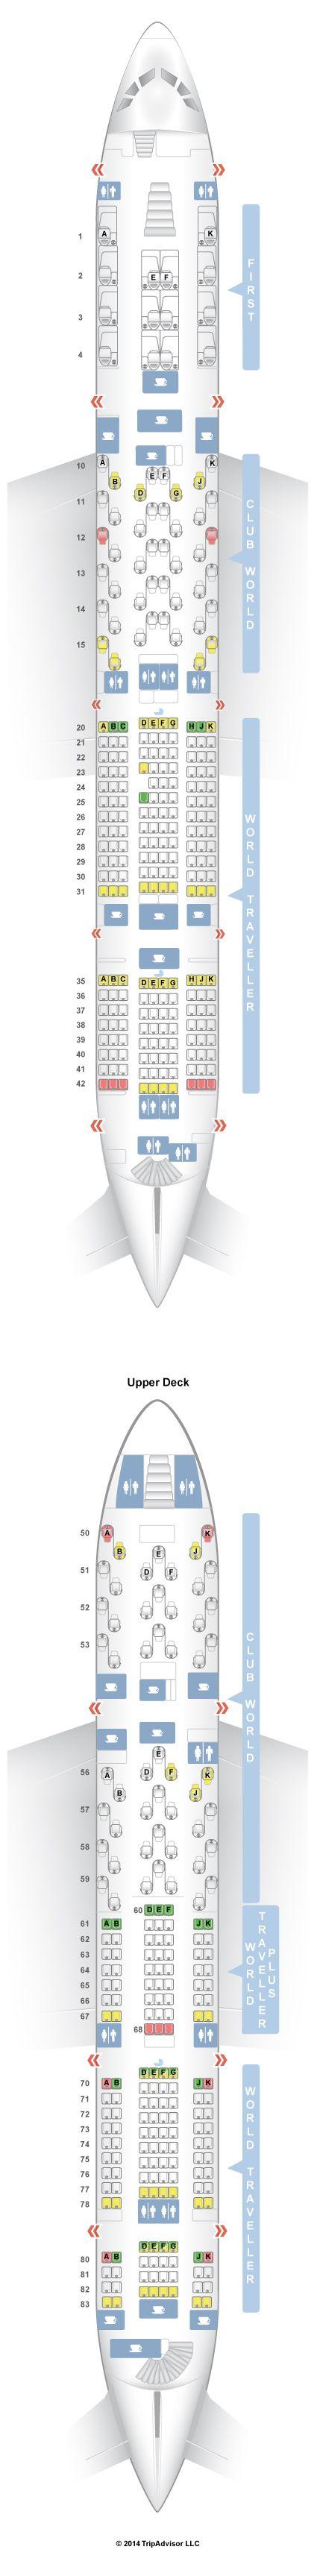 SeatGuru Seat Map British Airways Airbus A380-800 (388)